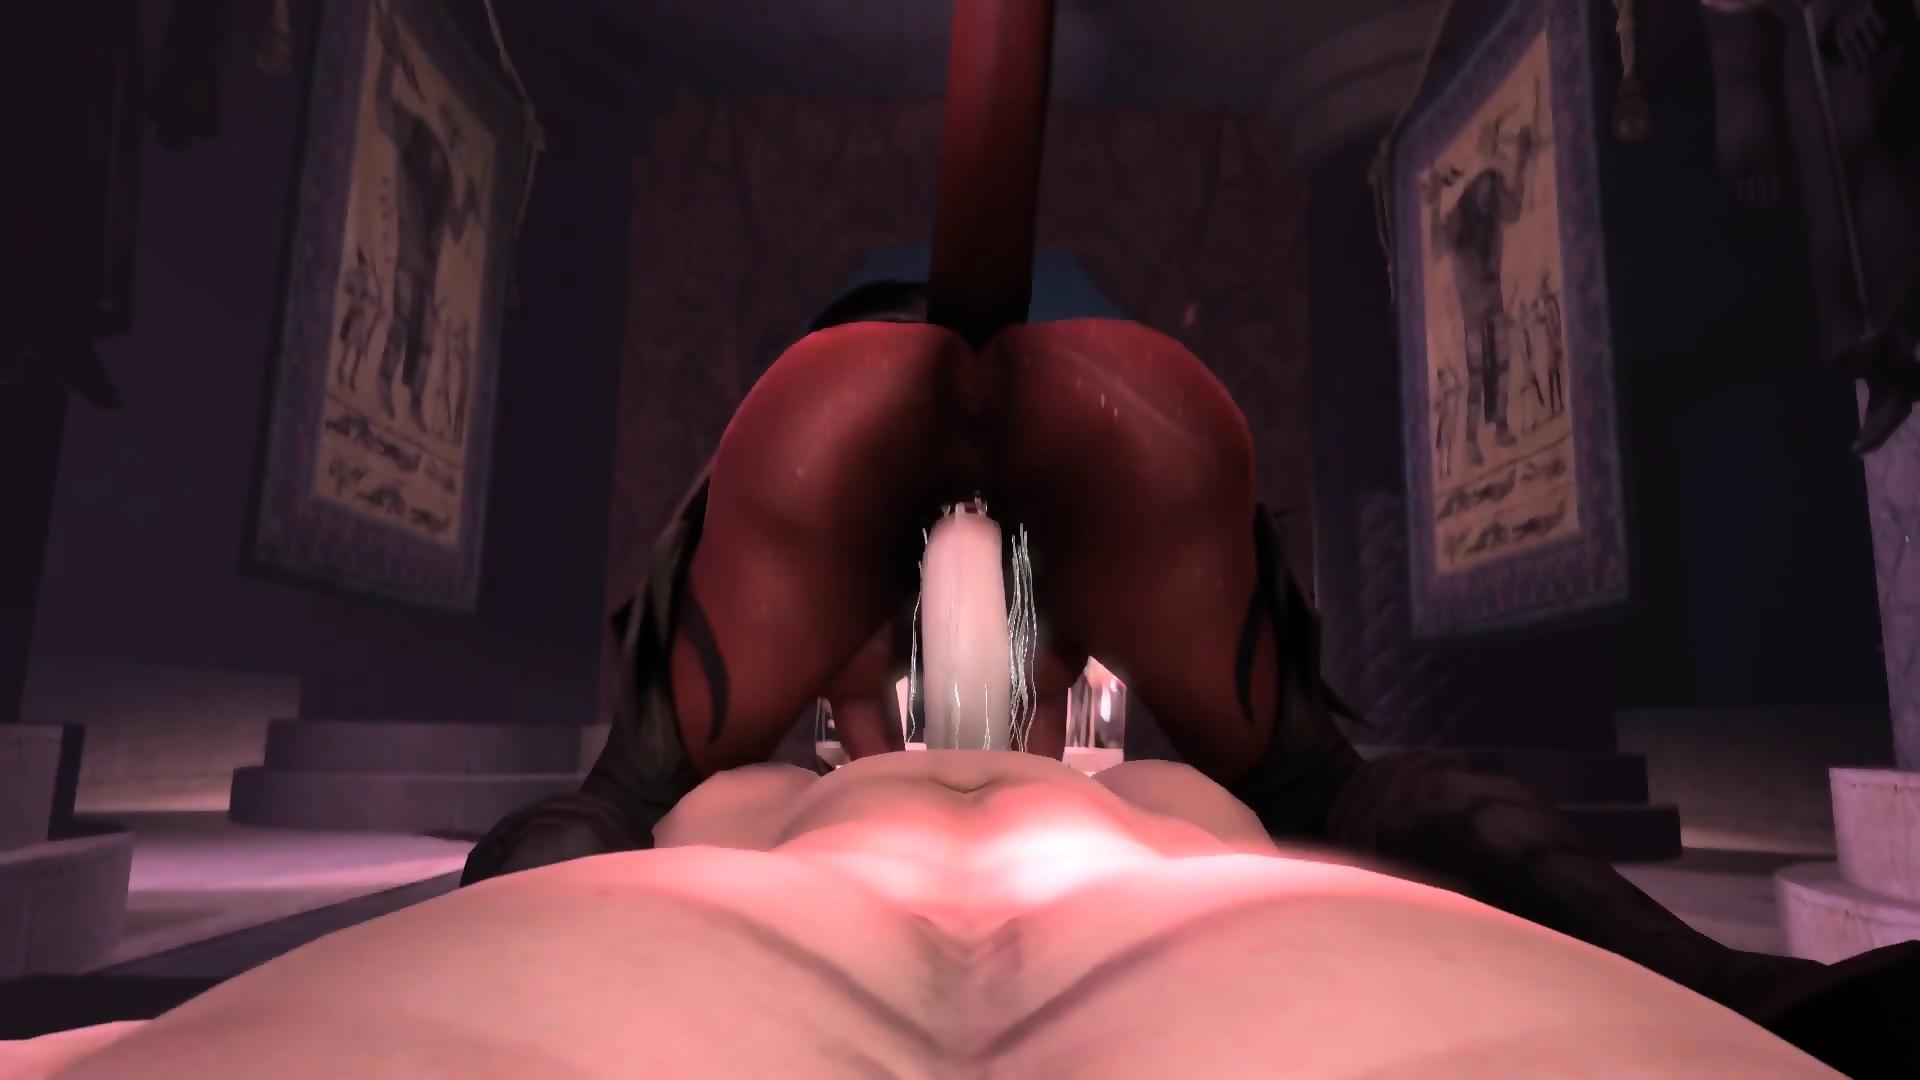 Porno Horror Film